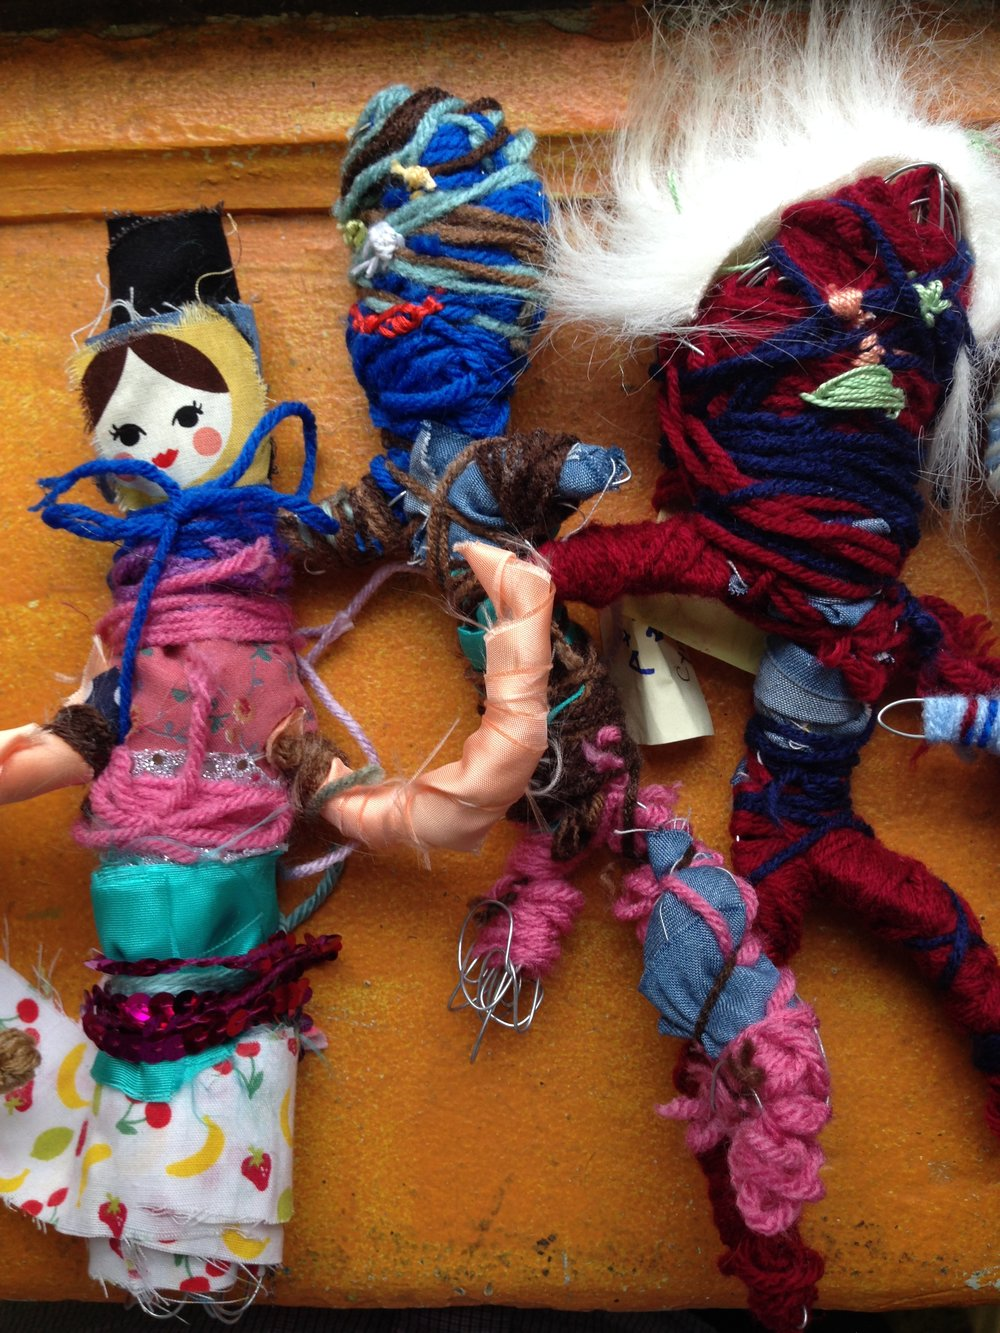 Fabulous Fabricated Found Fabric Figures